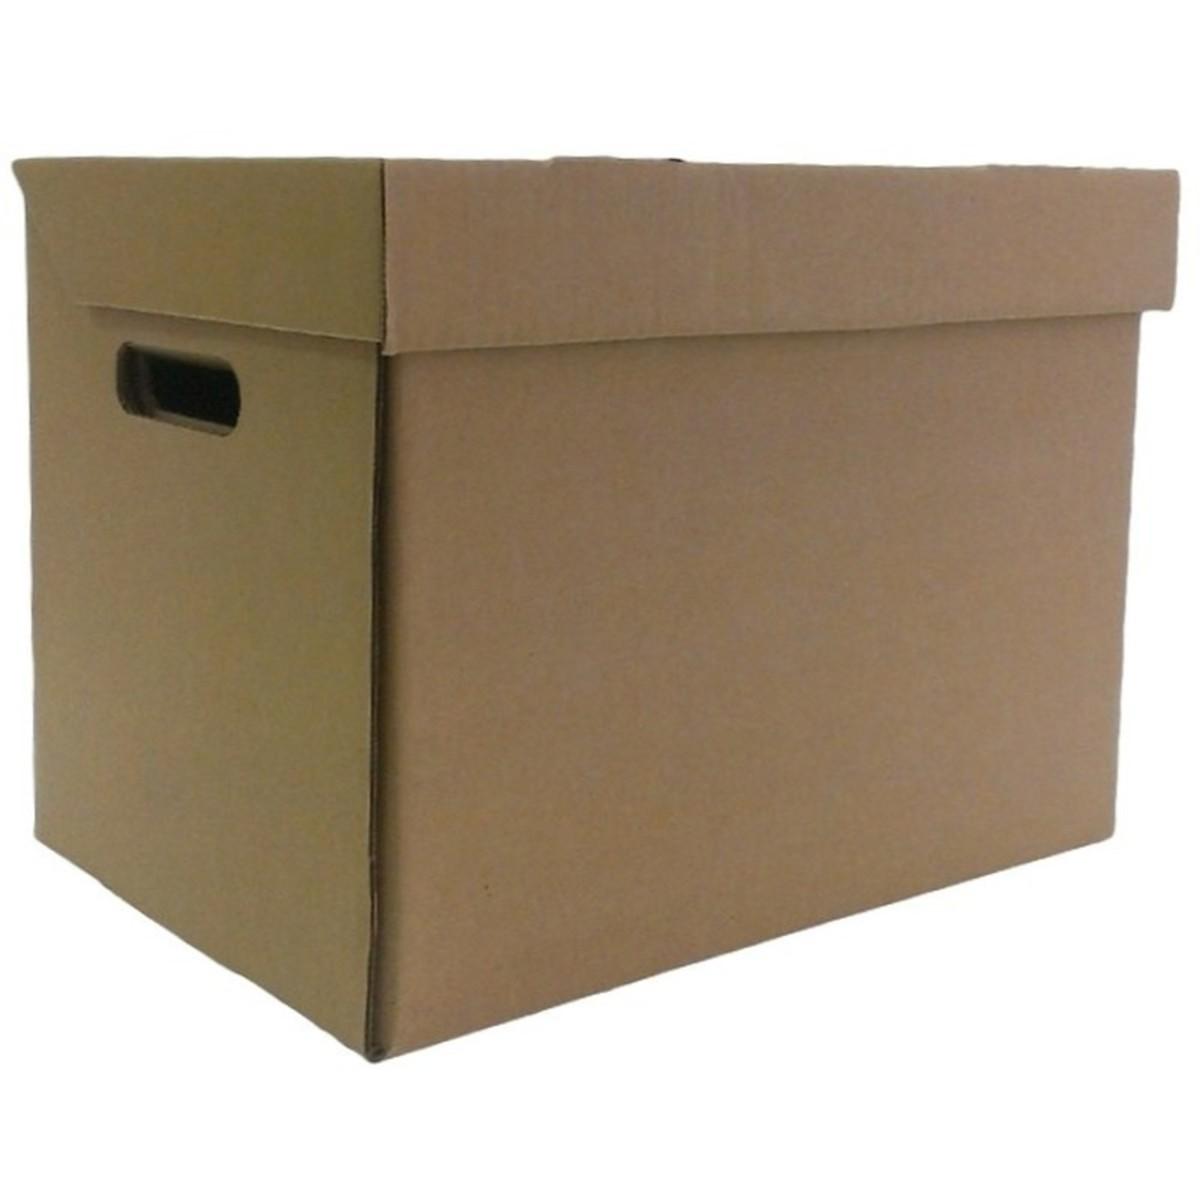 Коробка с крышкой 25х34х26 см картон